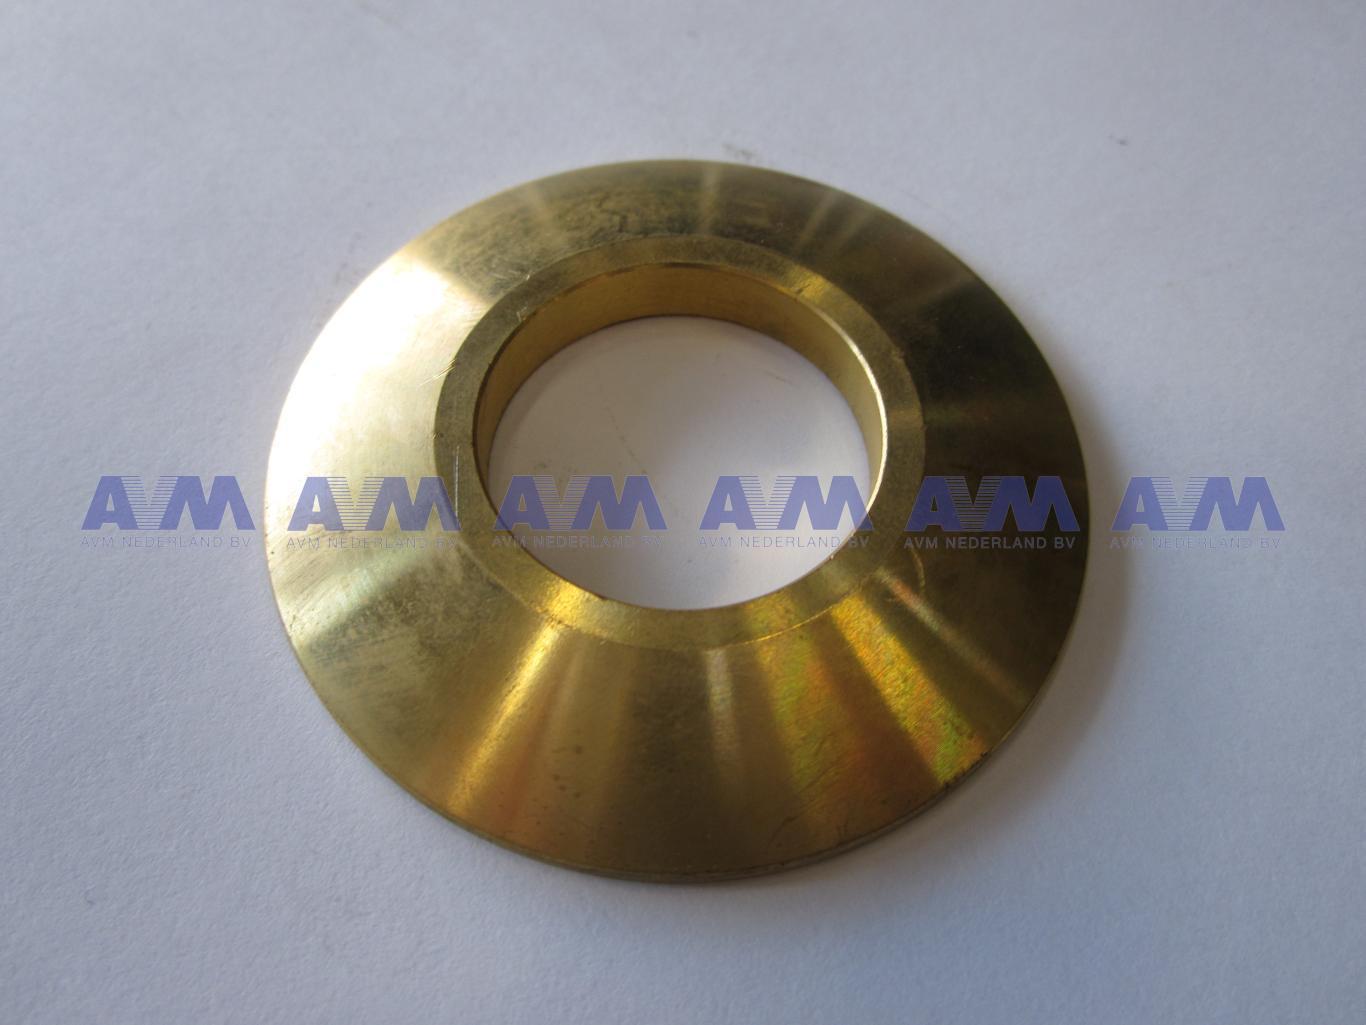 Schijf brons Q-52454-70 PPM